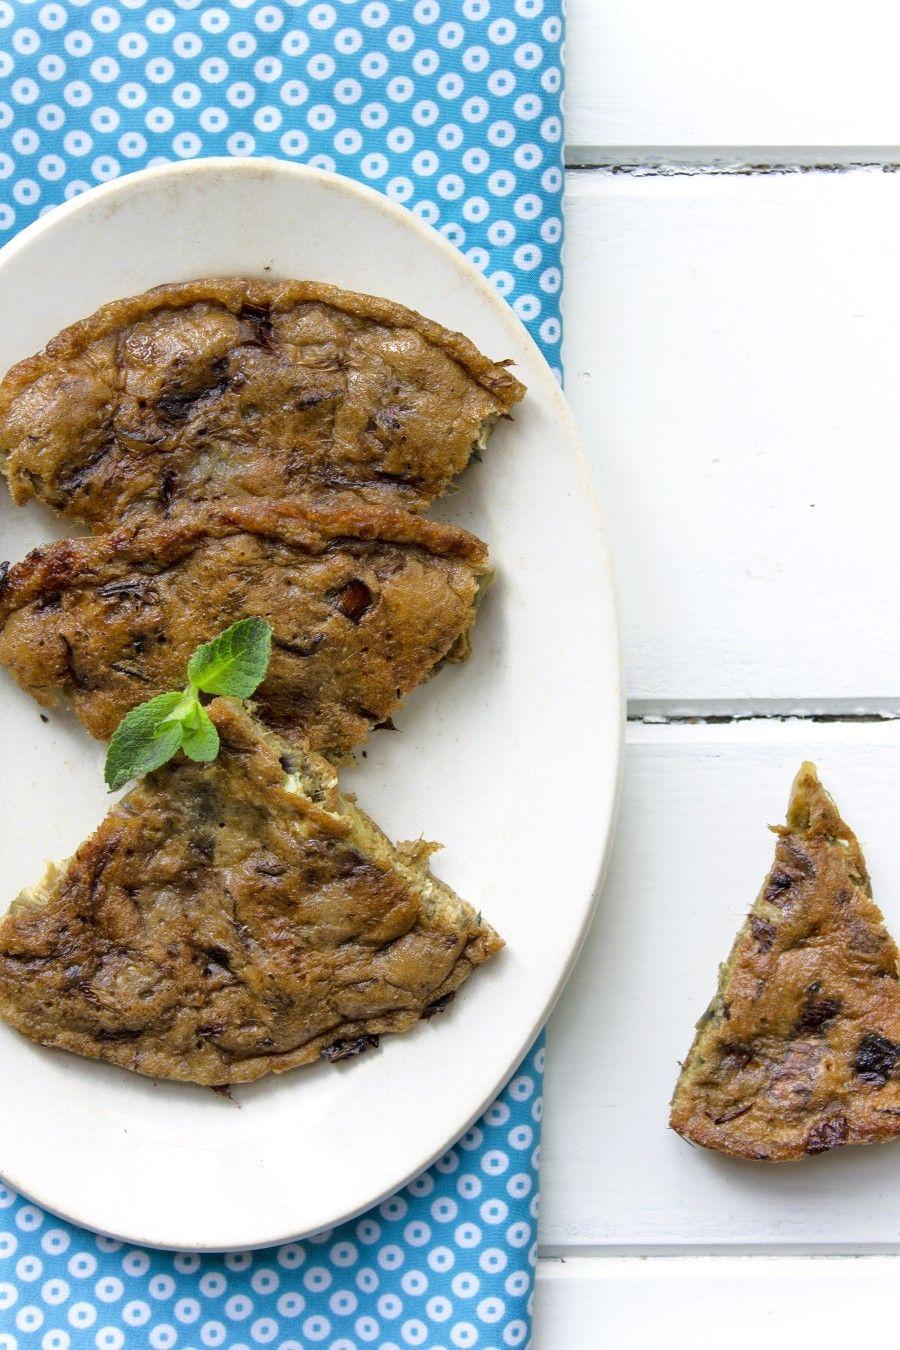 carciofi-al-microonde-contemporaneo-food